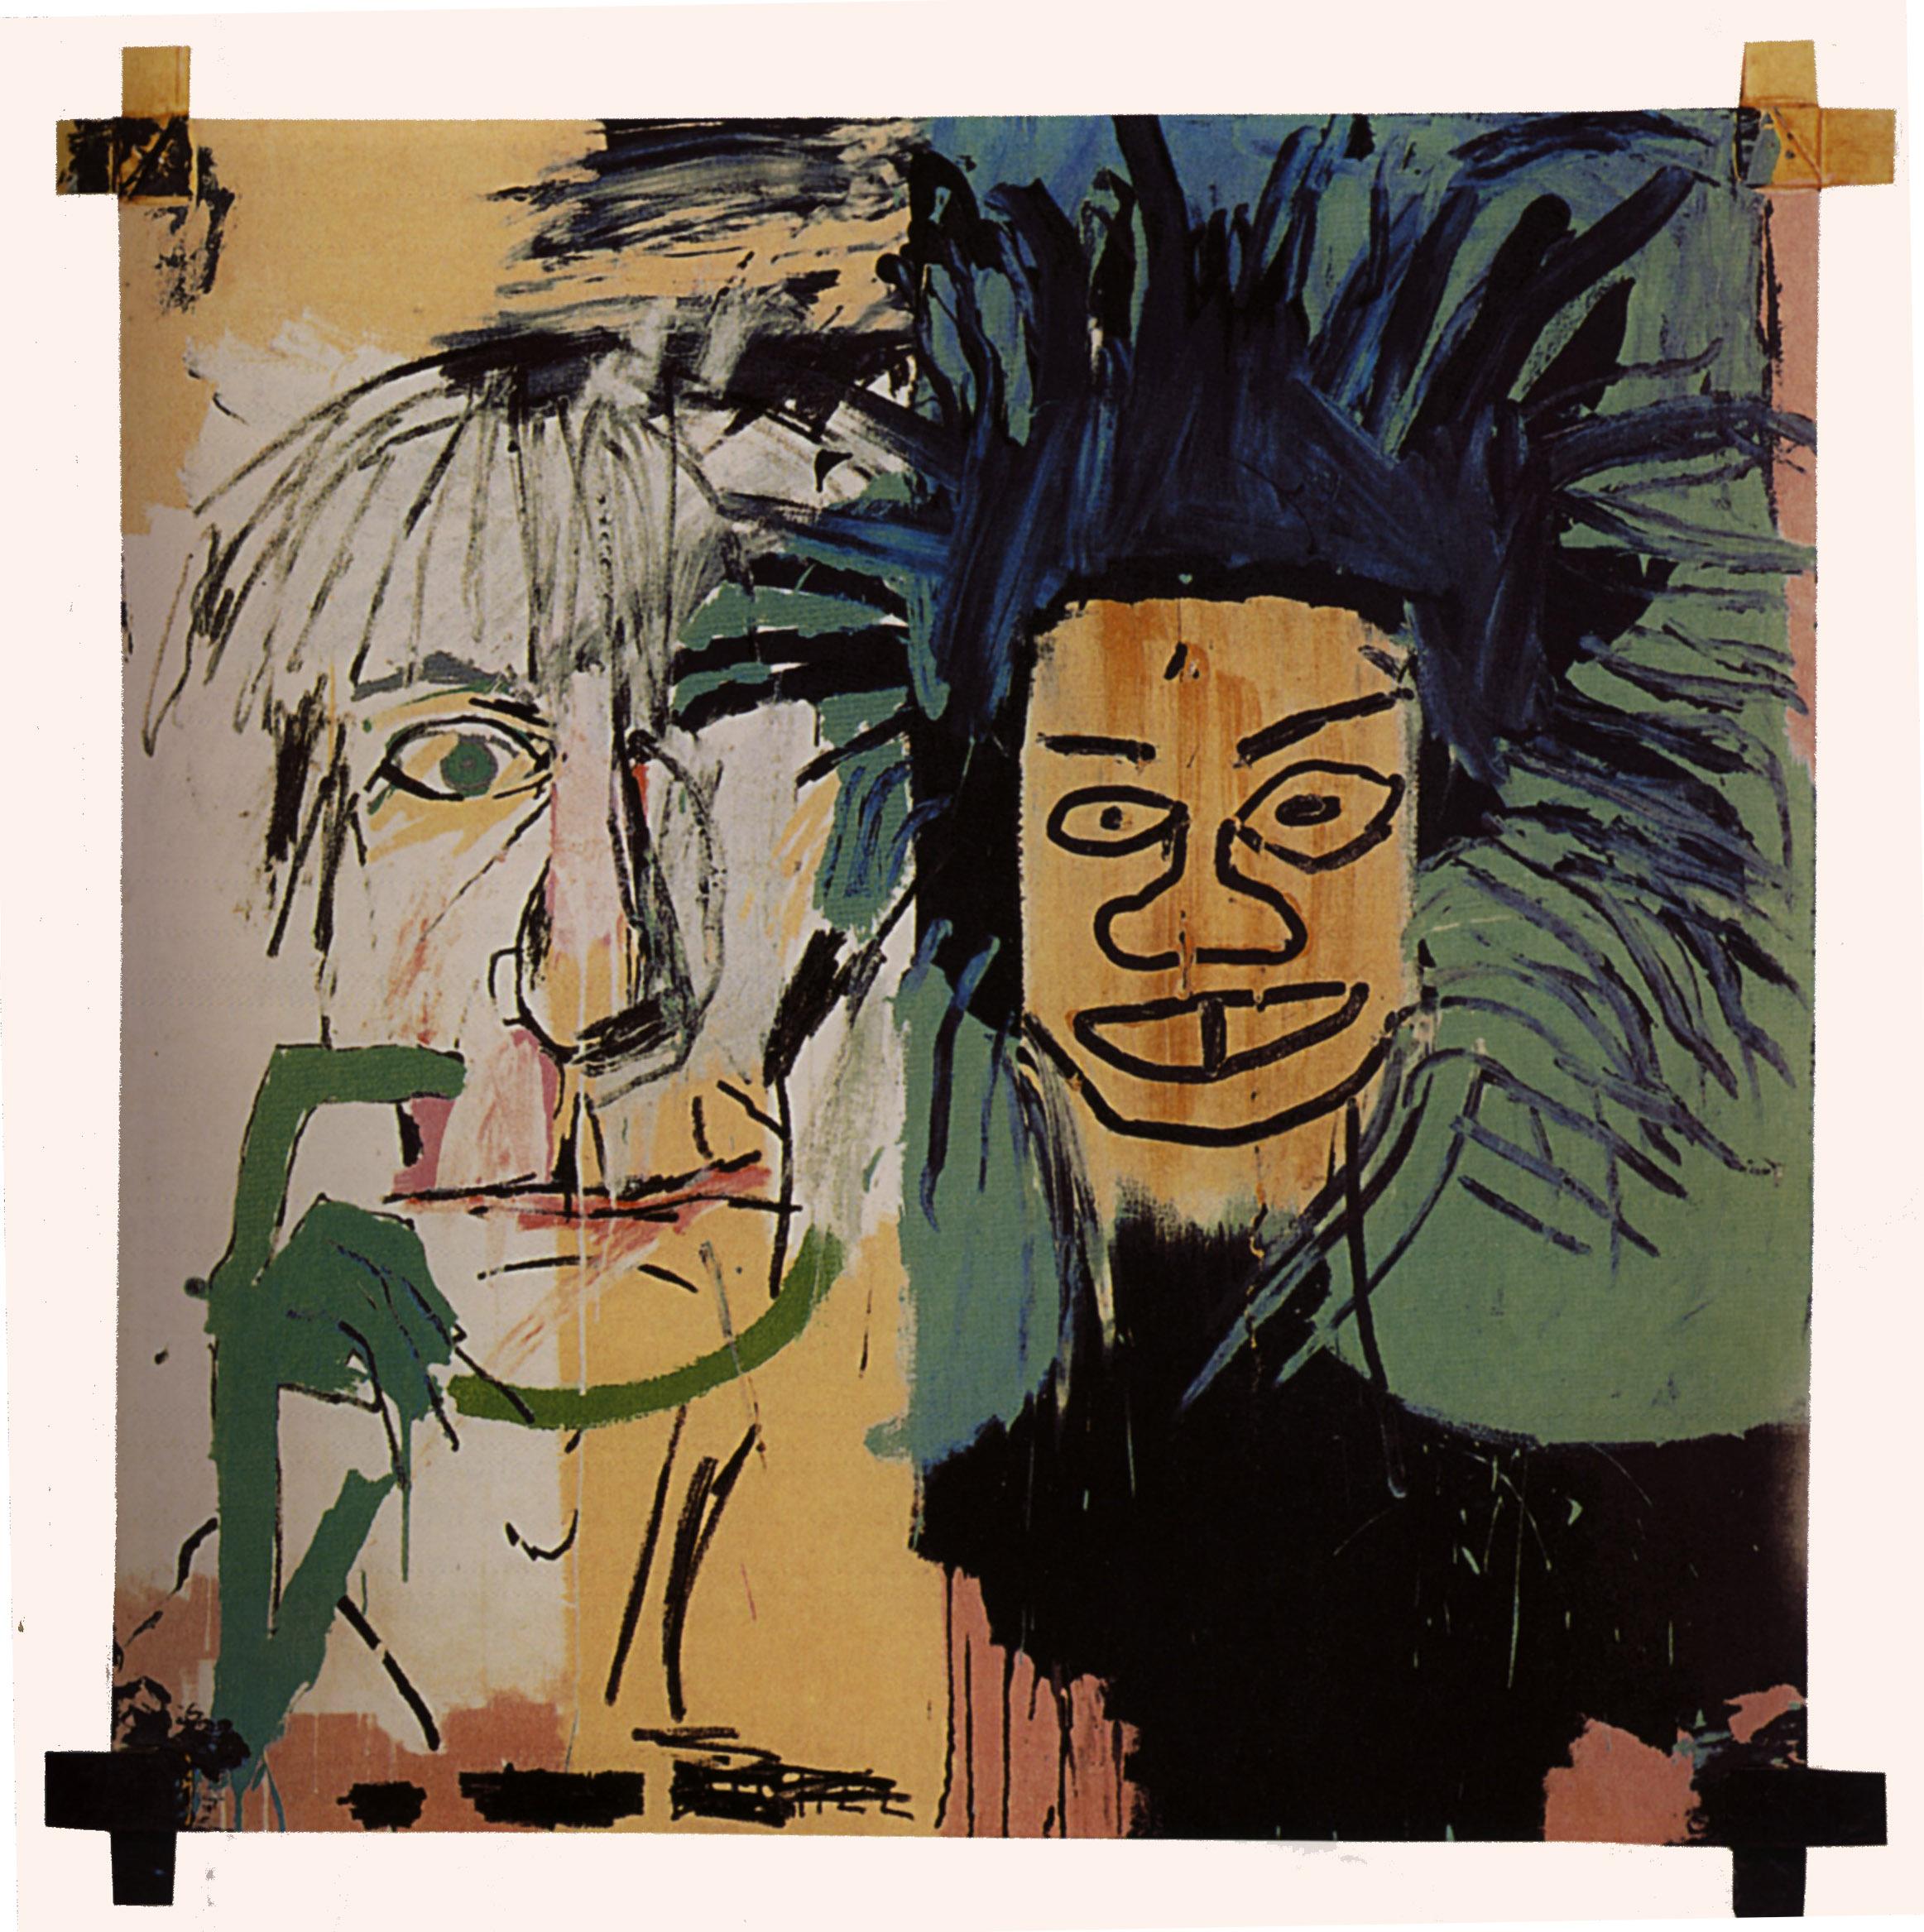 Philistines, 1982 - Jean-Michel Basquiat - WikiArt.org